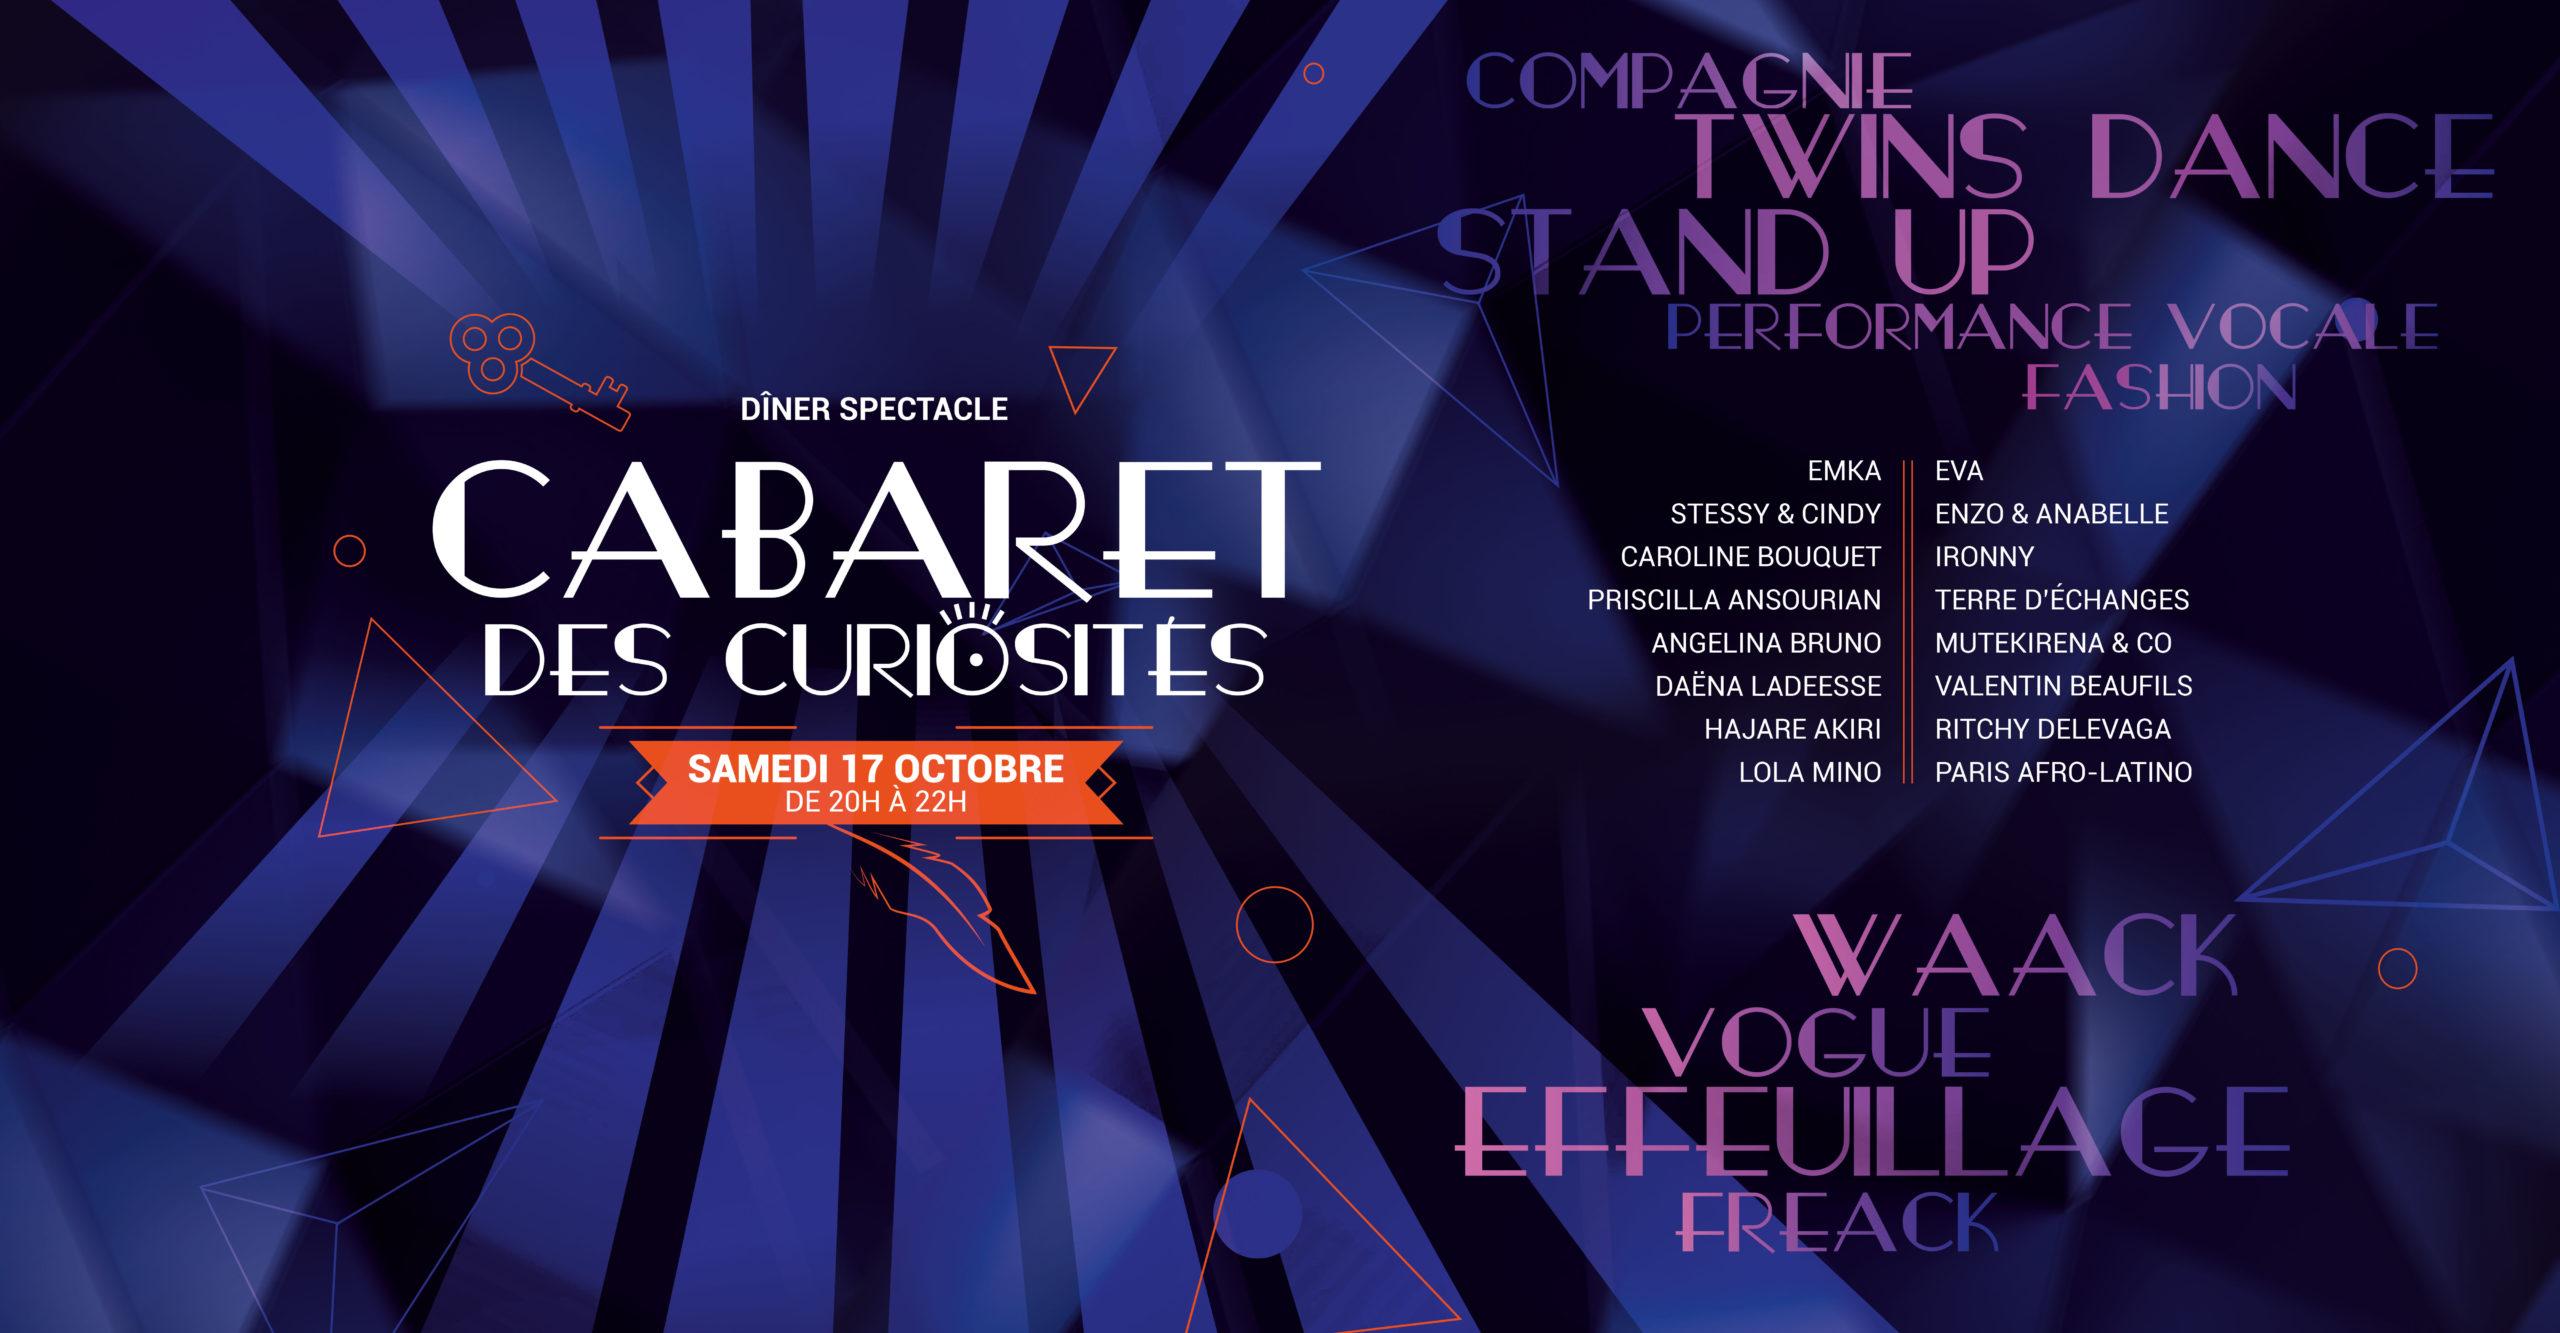 Cabaret des curiosités Samedi 17 octobre 2020 20h à 22h